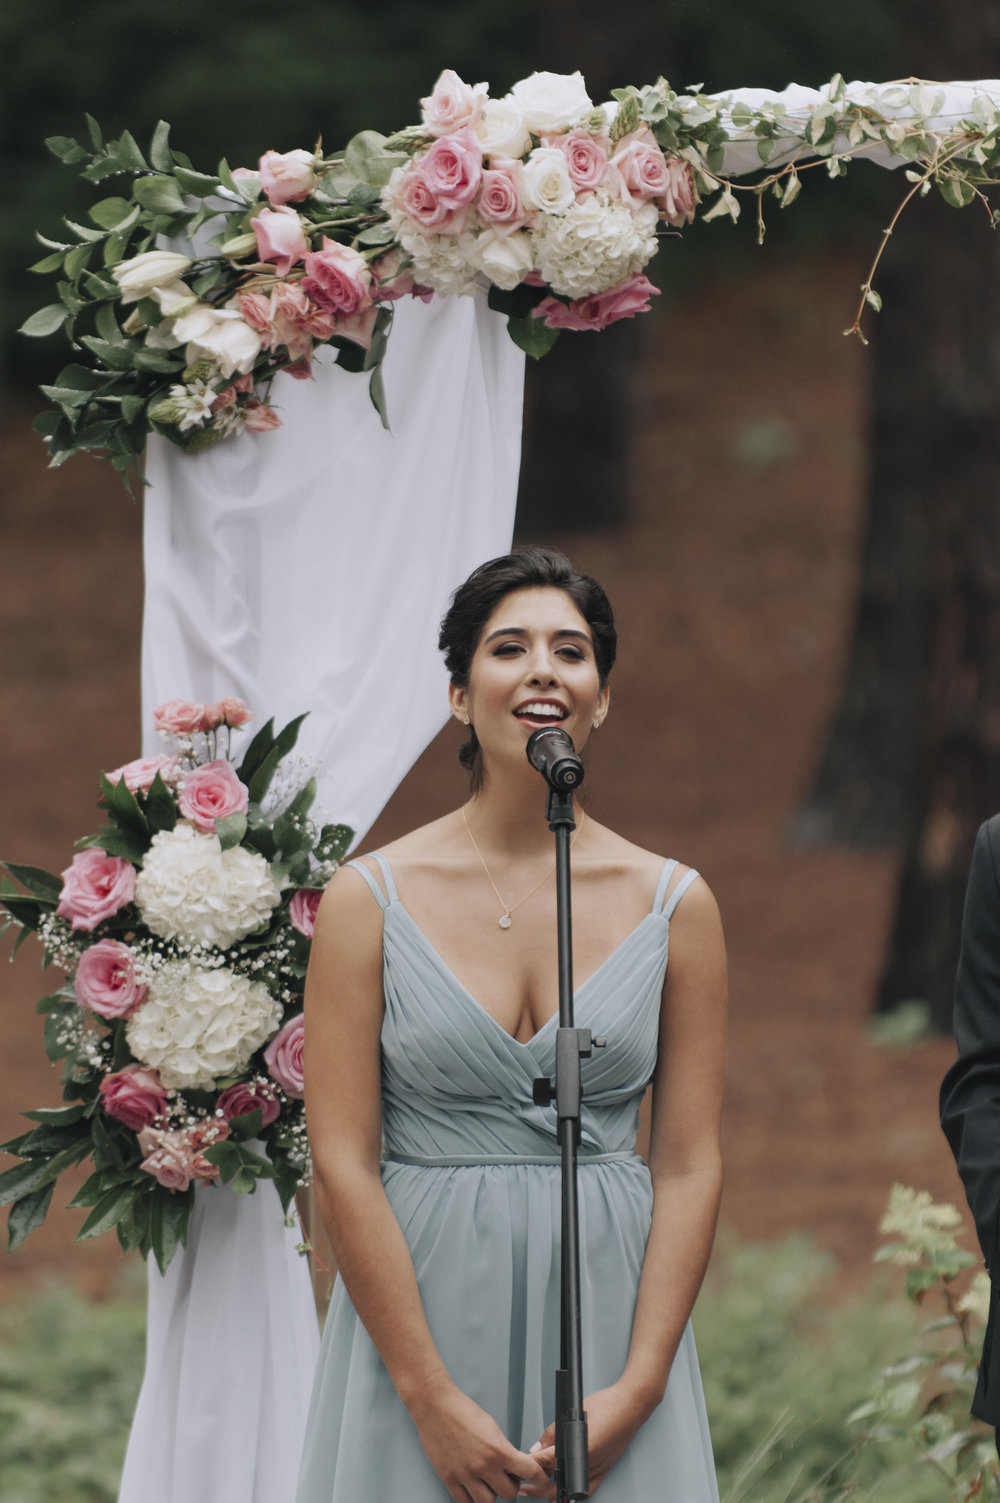 oakhurst-country-club-wedding-photographer-clarkson-michigan-023.jpg